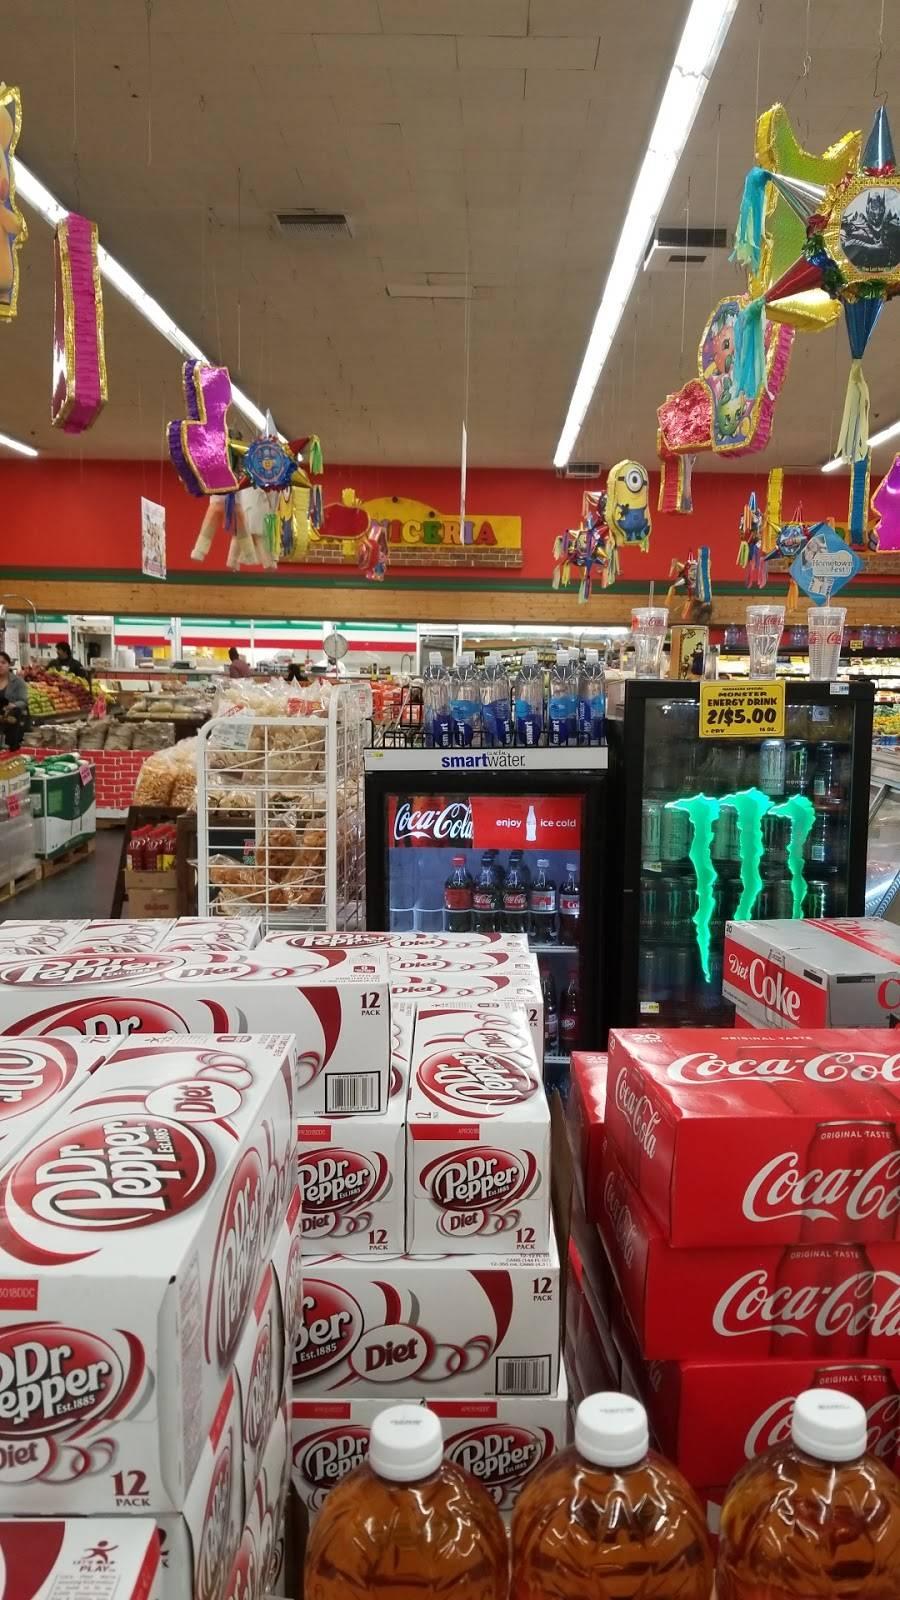 Foodland San Diego CA - supermarket    Photo 10 of 10   Address: 5075 Federal Blvd, San Diego, CA 92102, USA   Phone: (619) 262-9992